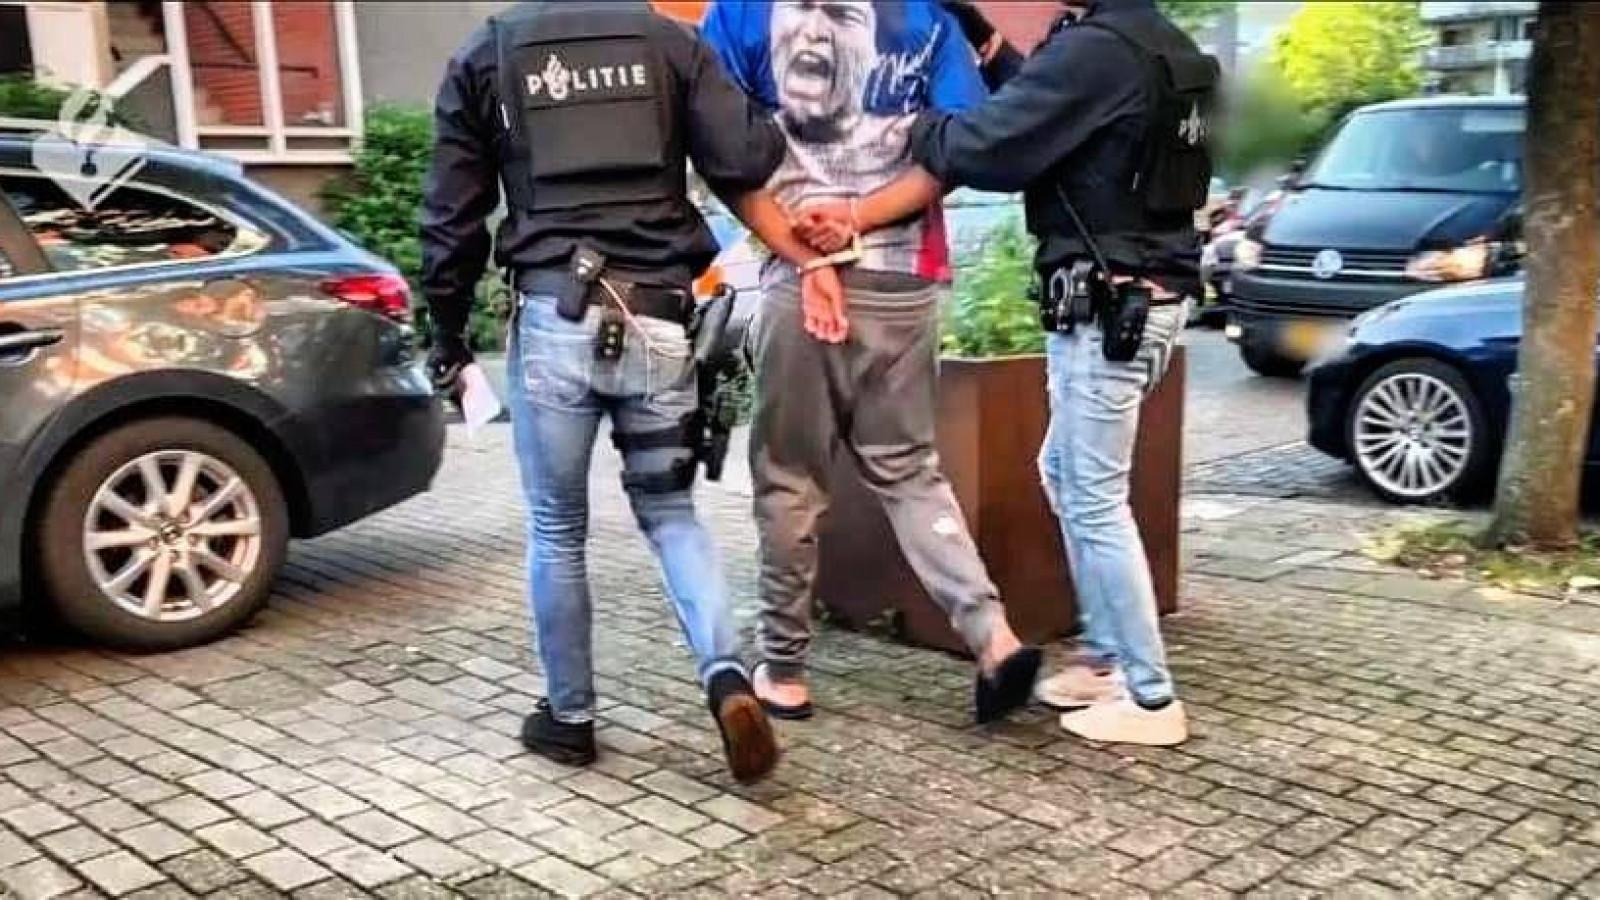 Facebook / Politie Amsterdam Overtoomse Sluis